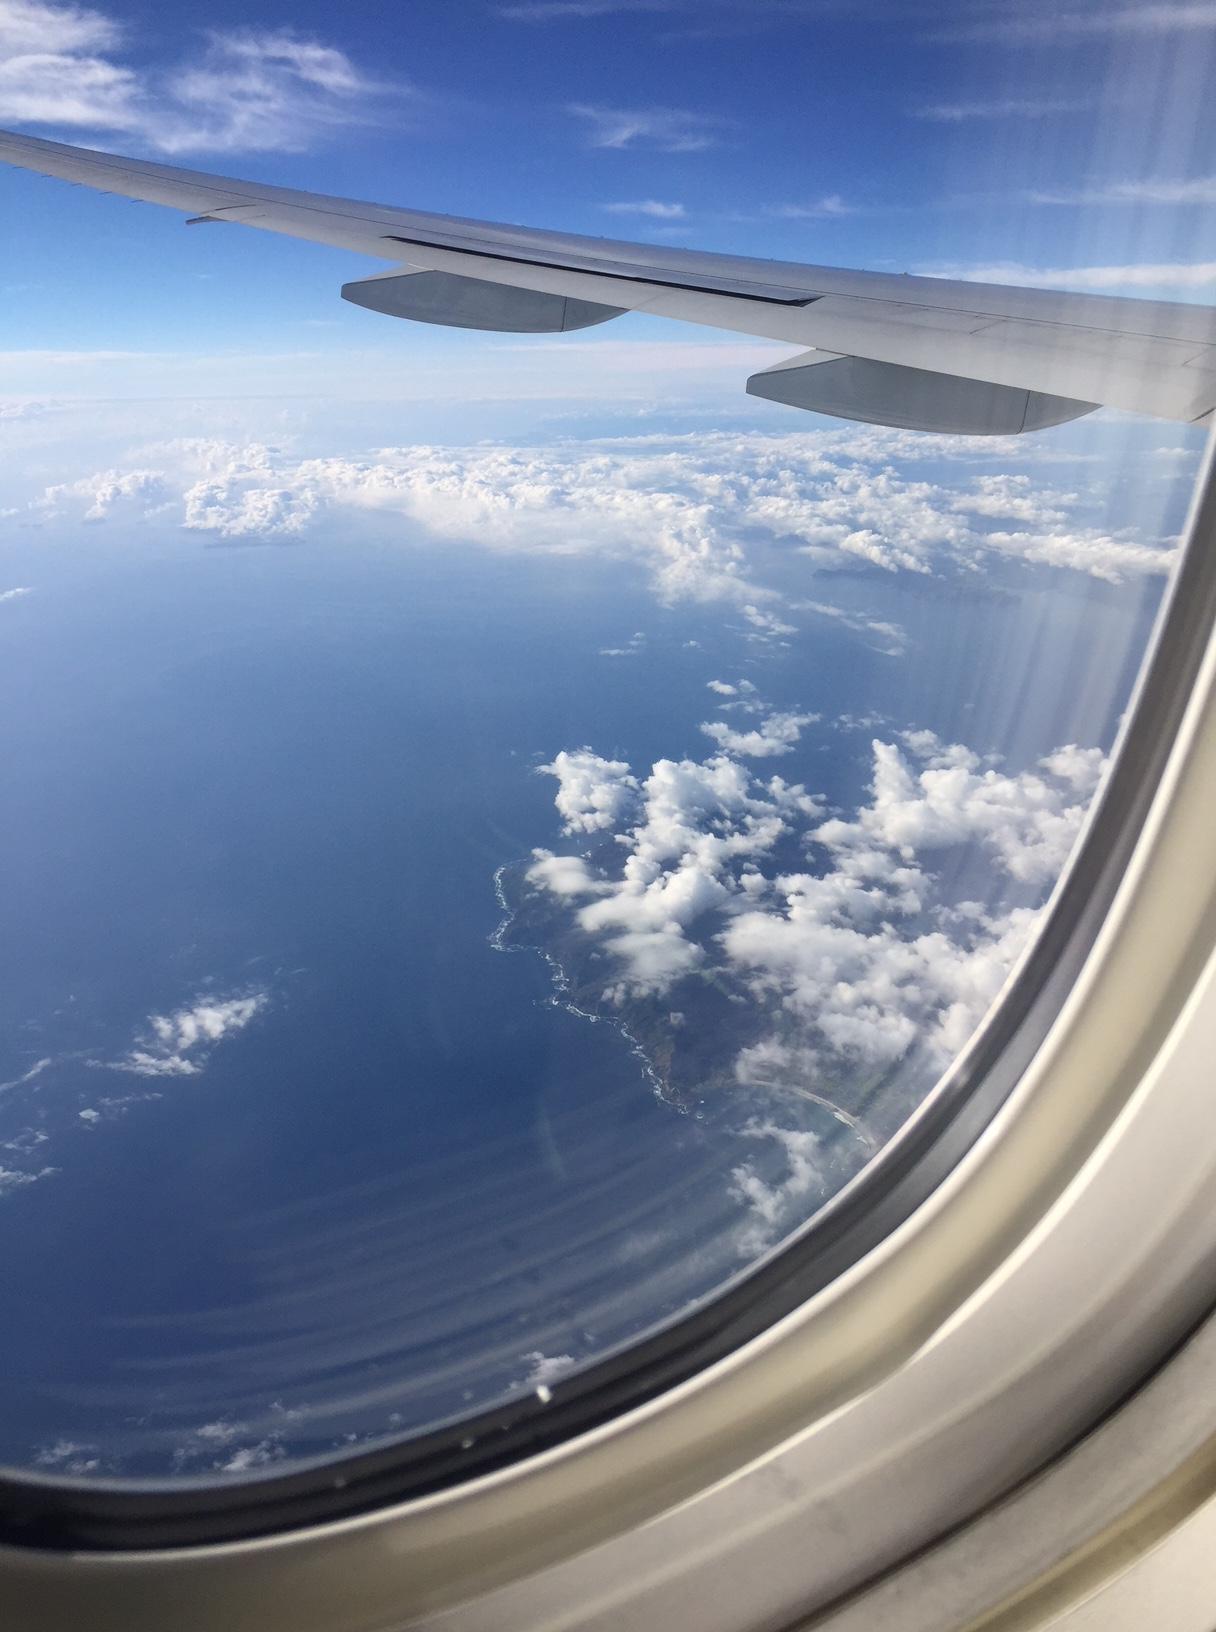 Requisite Airplane Window Shot Ramblings In New Zealand